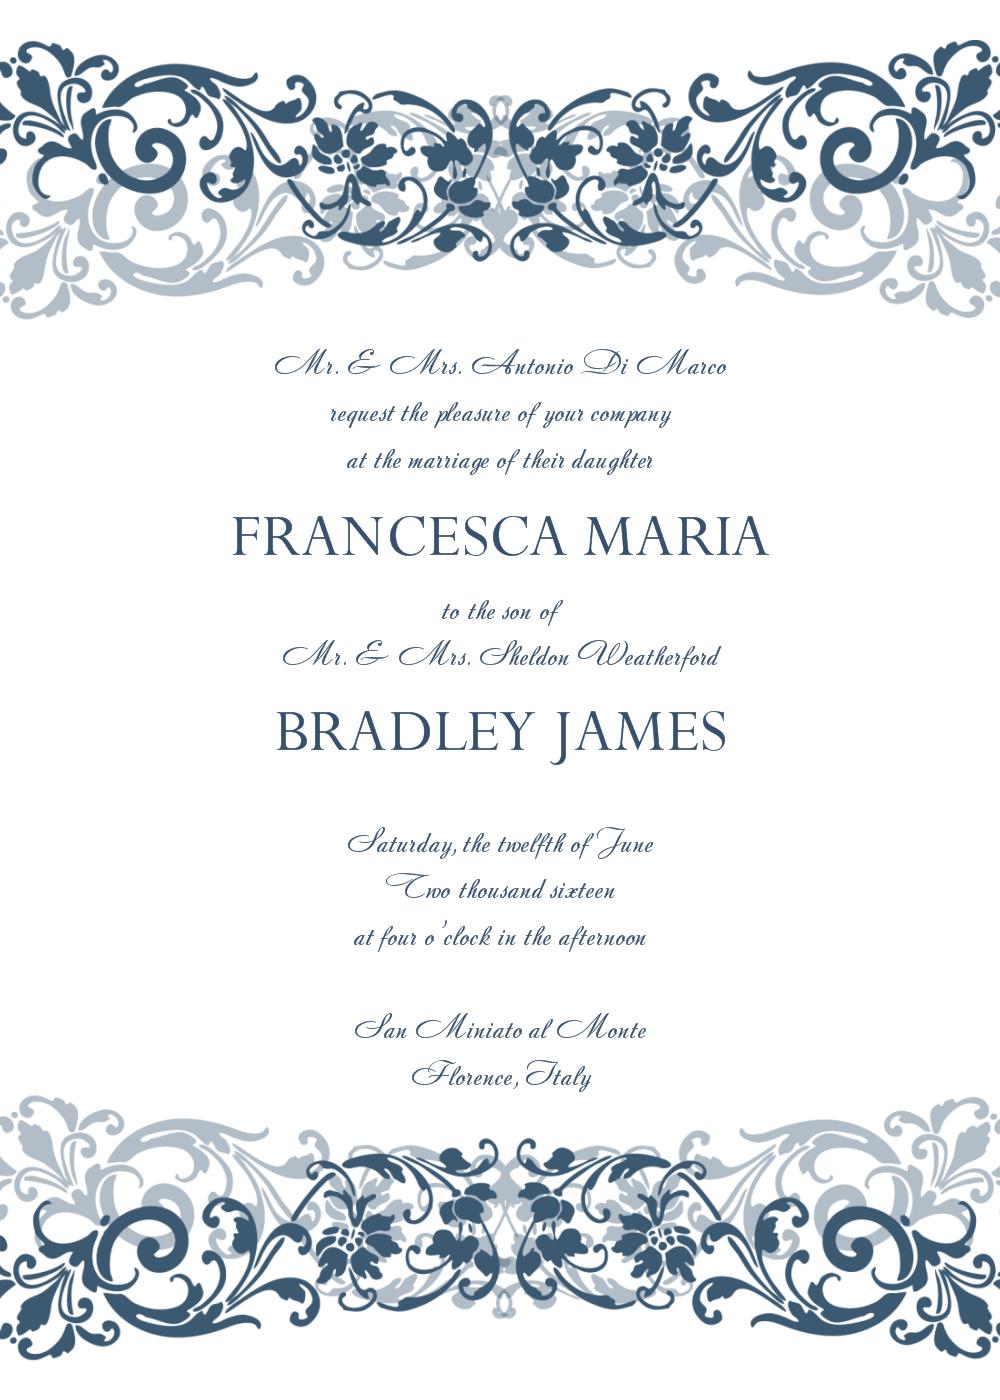 Free Wedding Invitation Templates For Word 30 Free Wedding